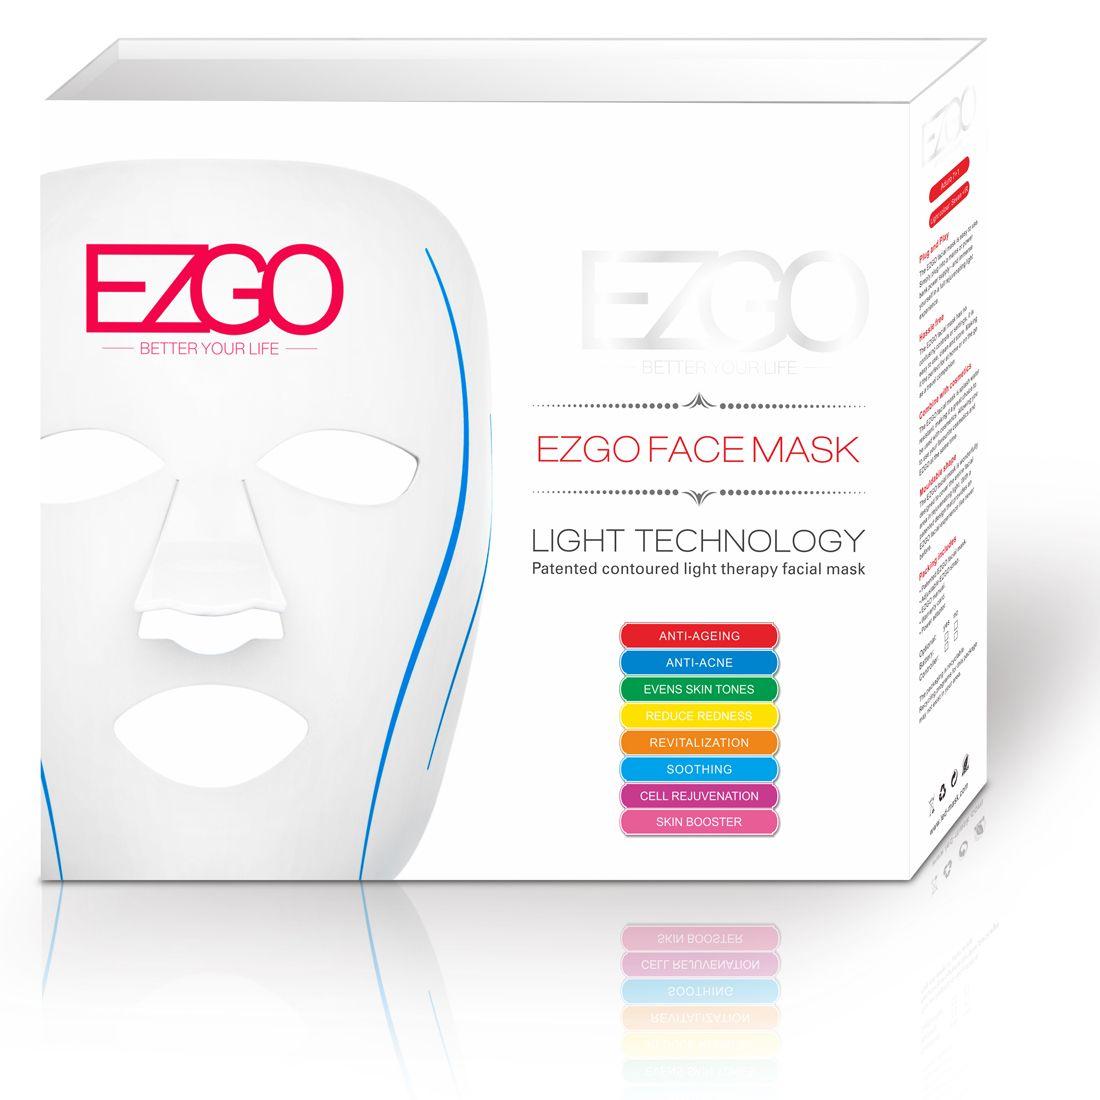 Photon Led Skin Rejuvenation Home Therapy Mask, Photon Photodynamics ...